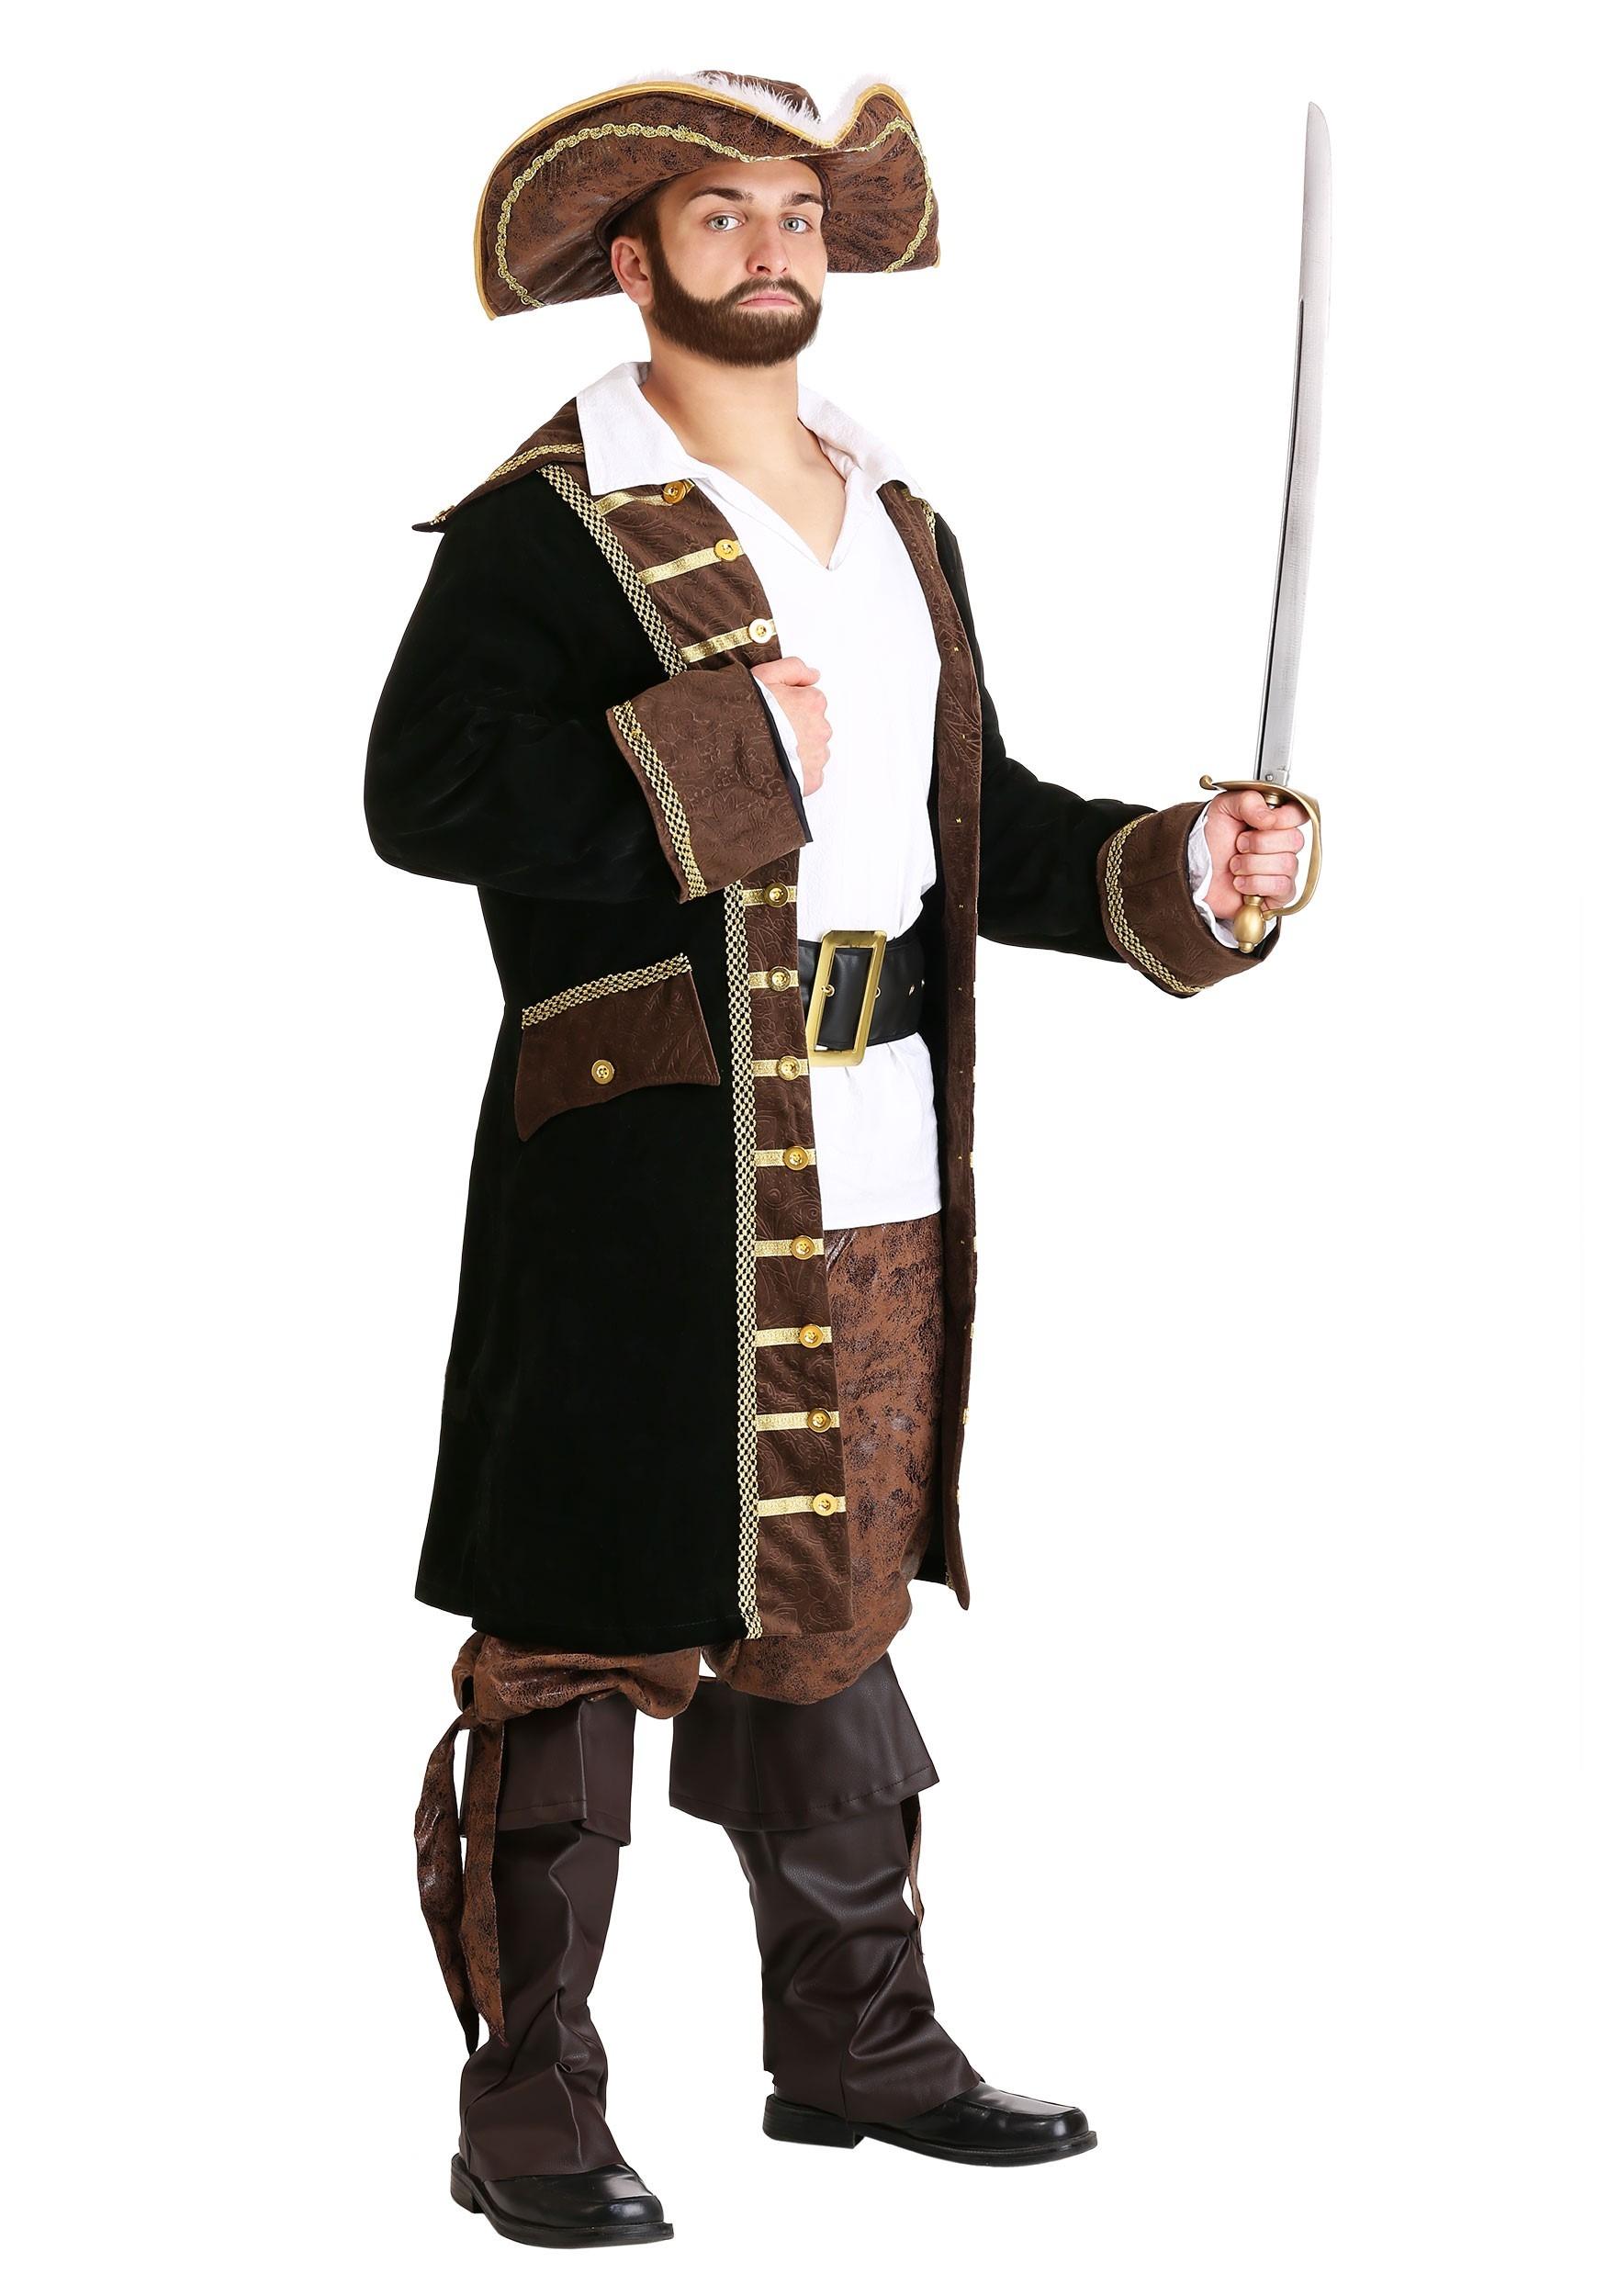 702cd72914028 Disfraz de pirata realista para hombre